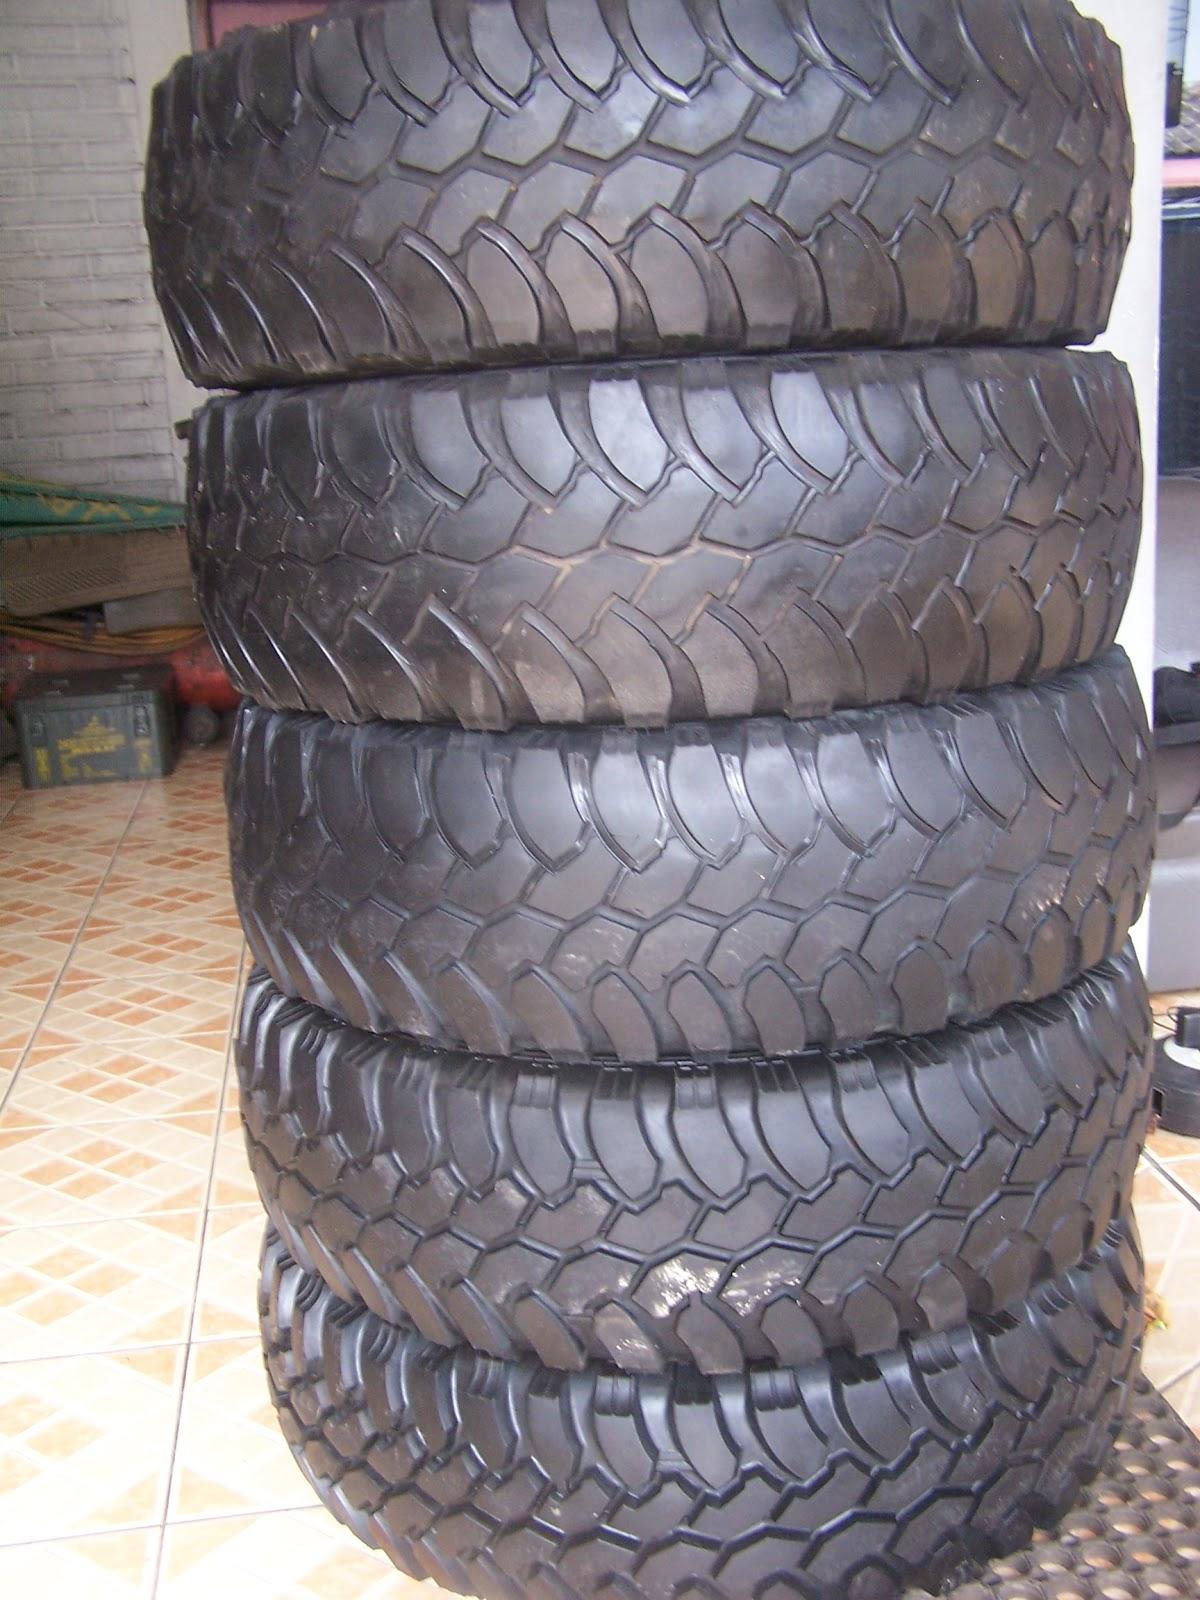 Jual Ban Mobil Achilles Harga Murah Gt Champiro Bxt Pro 195 65r15 Vocer Azmi Agustianzi 4x4 Second Radial Savero Mt 265 75 R16